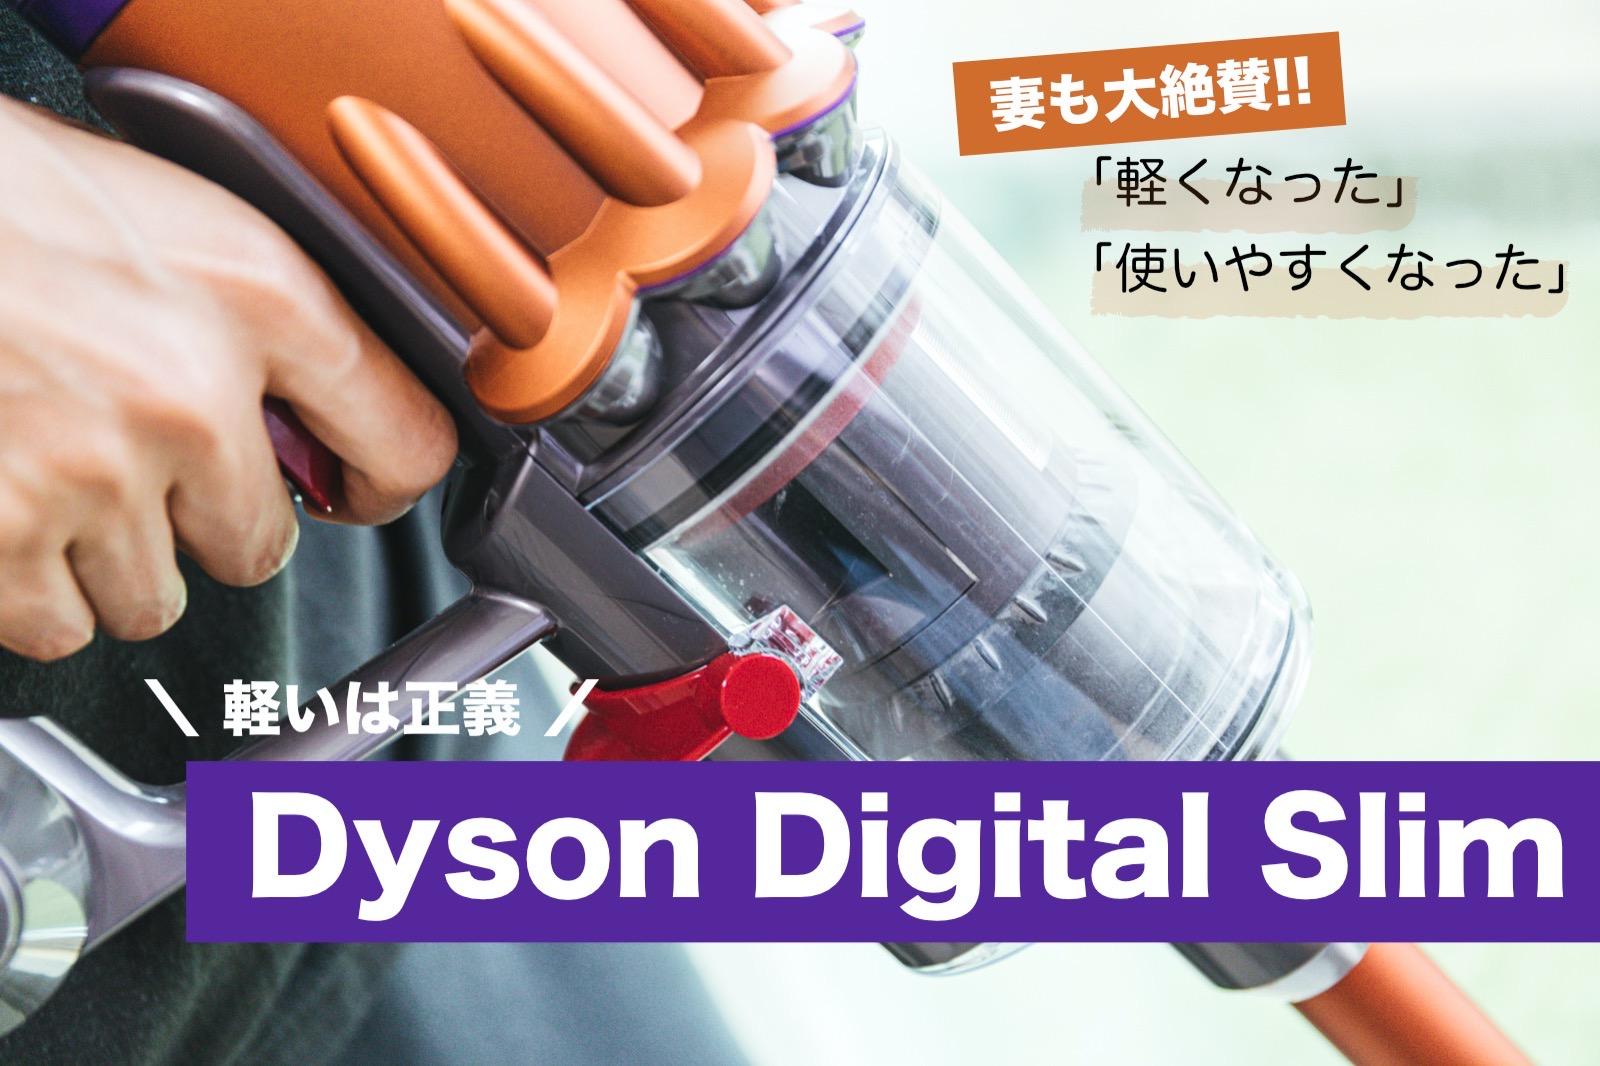 Dyson Digital Slim Review Top